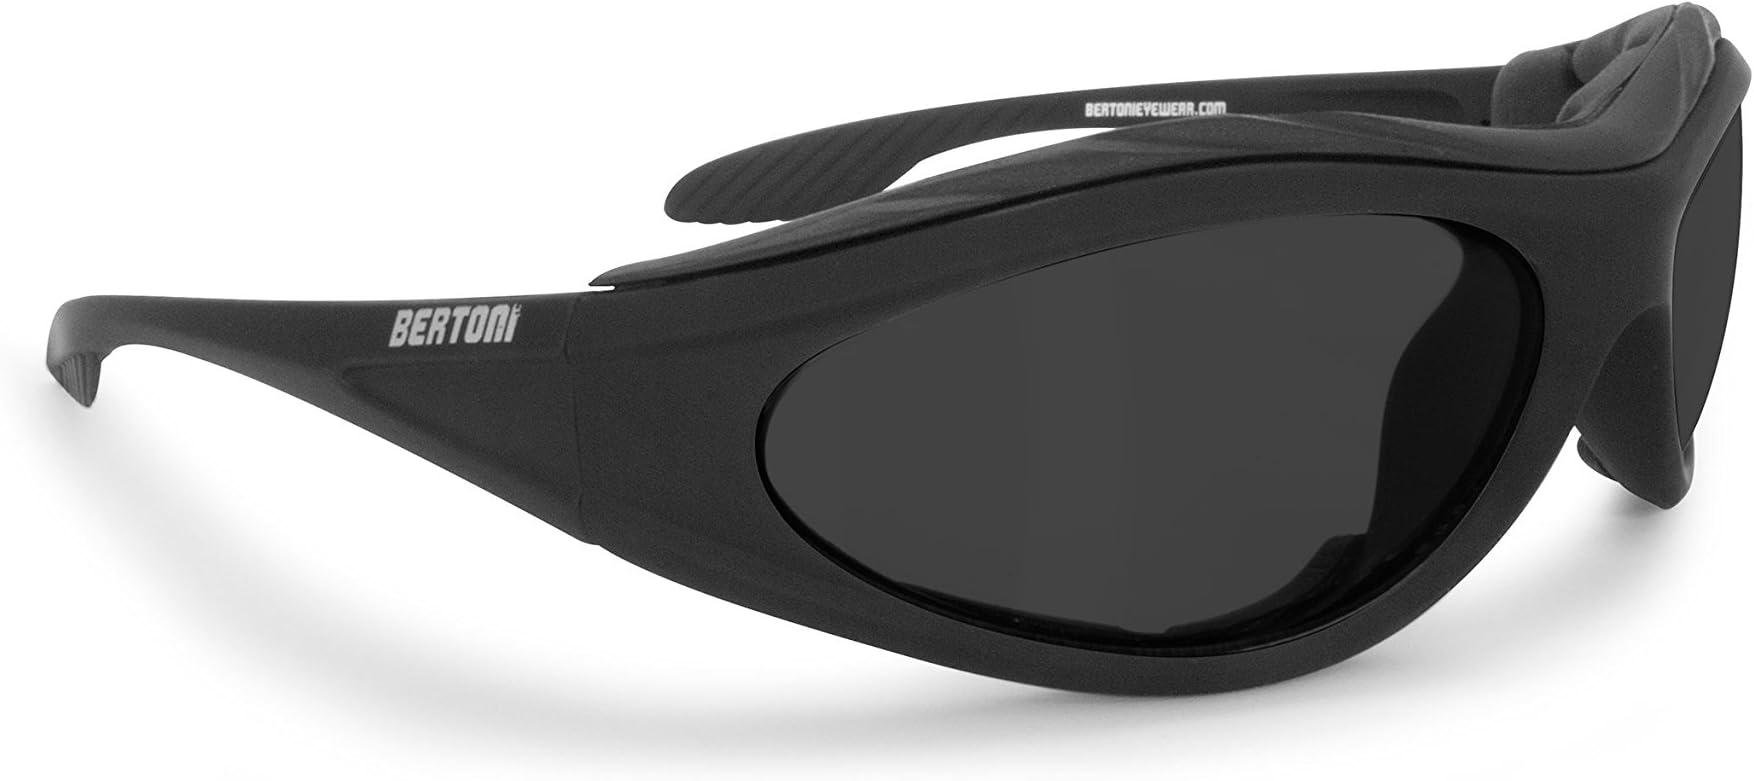 Bertoni Motorcycle Padded Glasses - Windproof Antifog Anticrash Lens - AF125C Italy Motorbyke Riding Sunglasses - Matt Black - Grey Lens